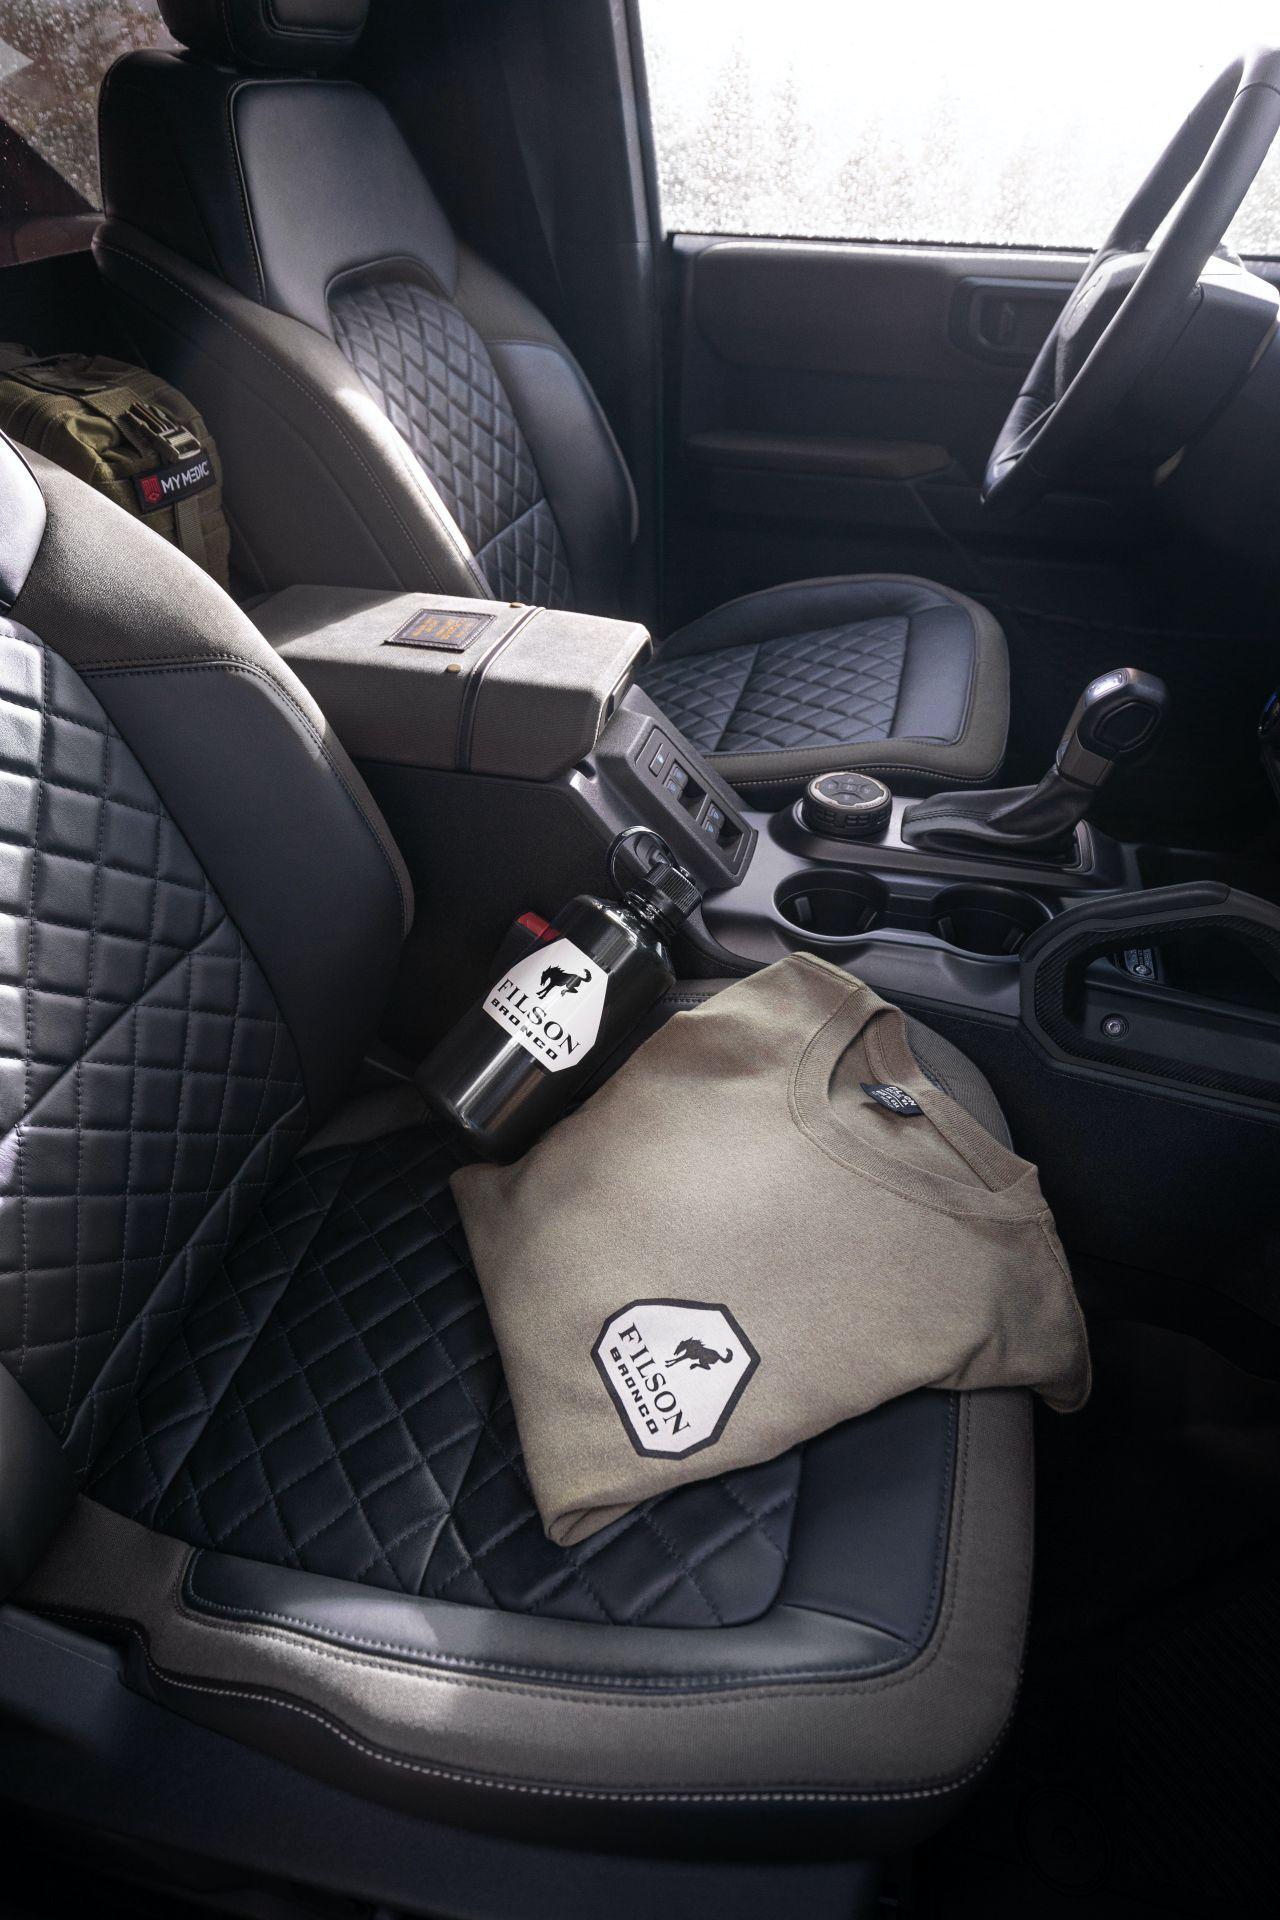 Ford-Bronco-Wildland-Fire-Rig-Concept-11